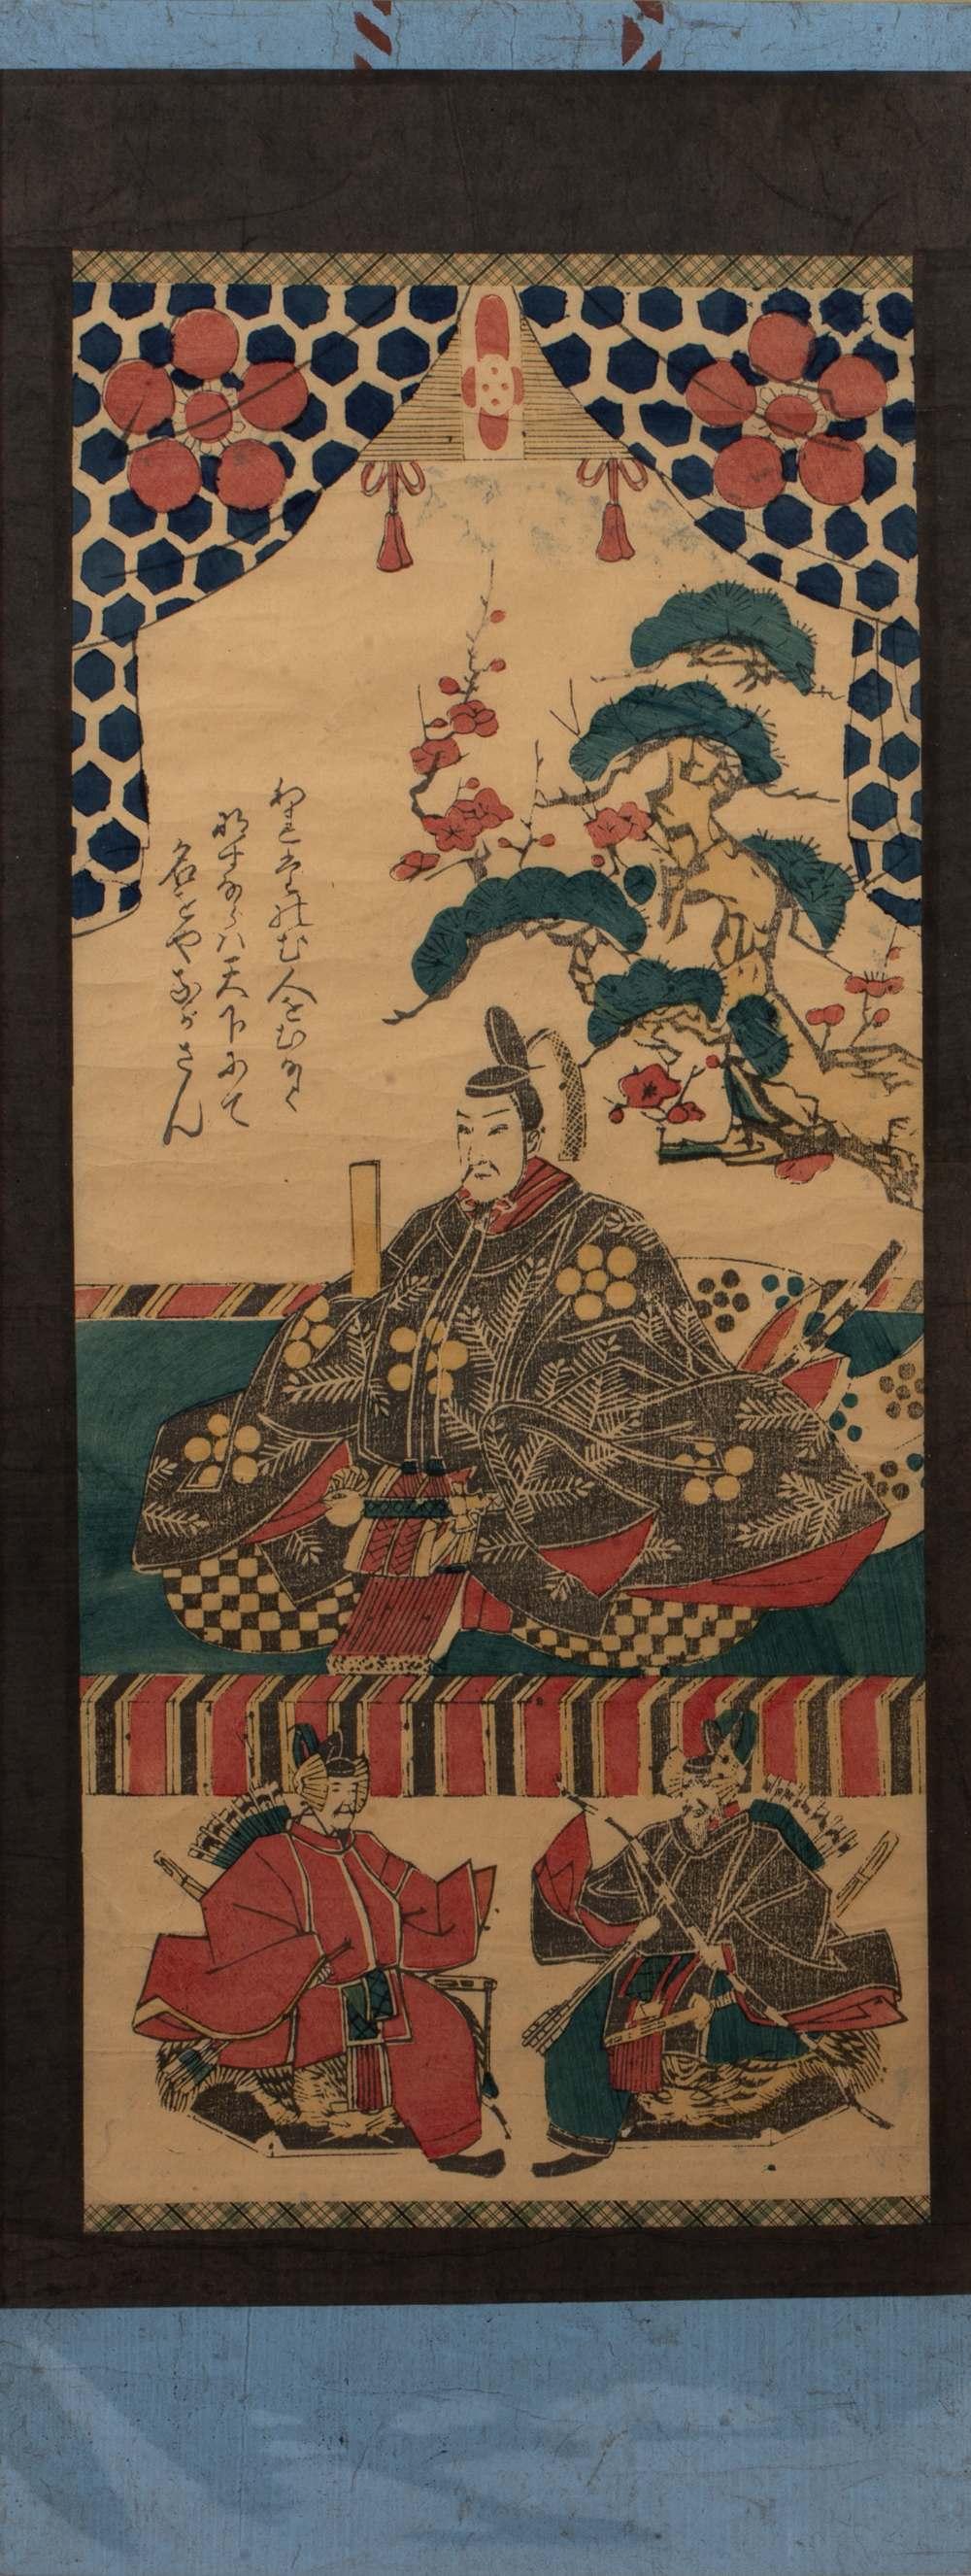 19th Century Japanese woodblock imitating a kakemono, 'Daimyo with Samurai', unsigned, mounted but